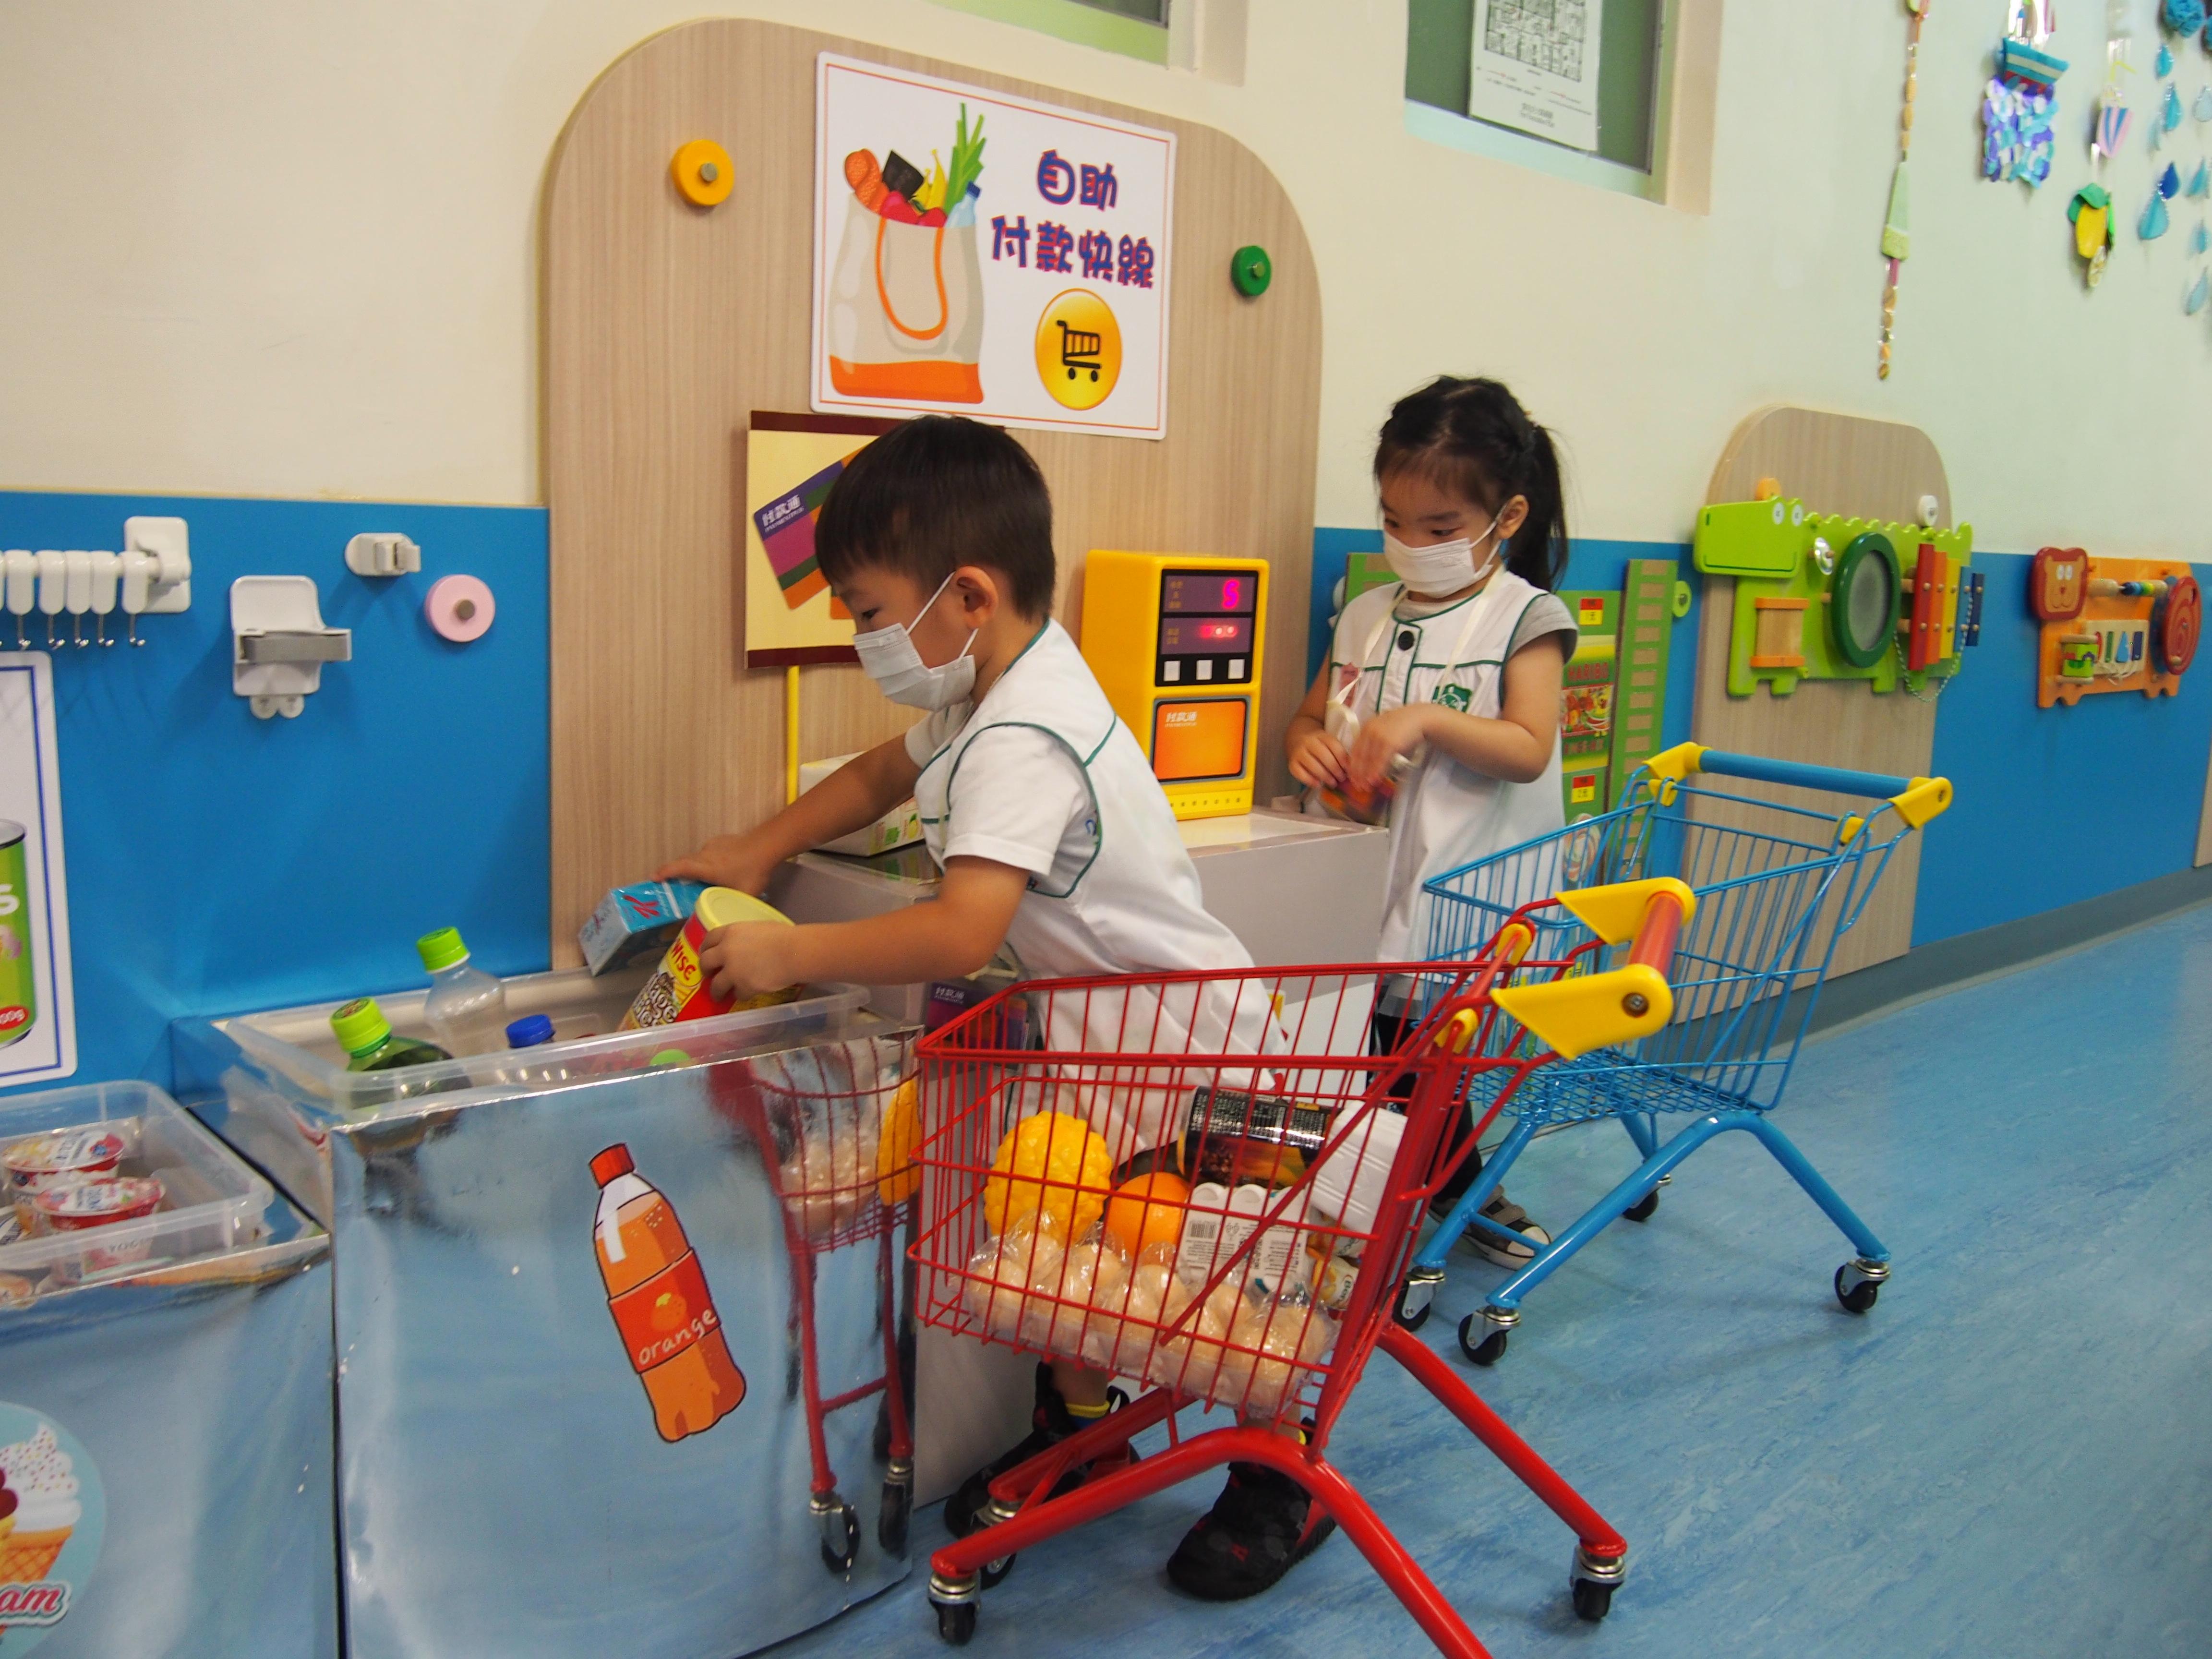 http://npmc.edu.hk/sites/default/files/p6300006_0.jpg